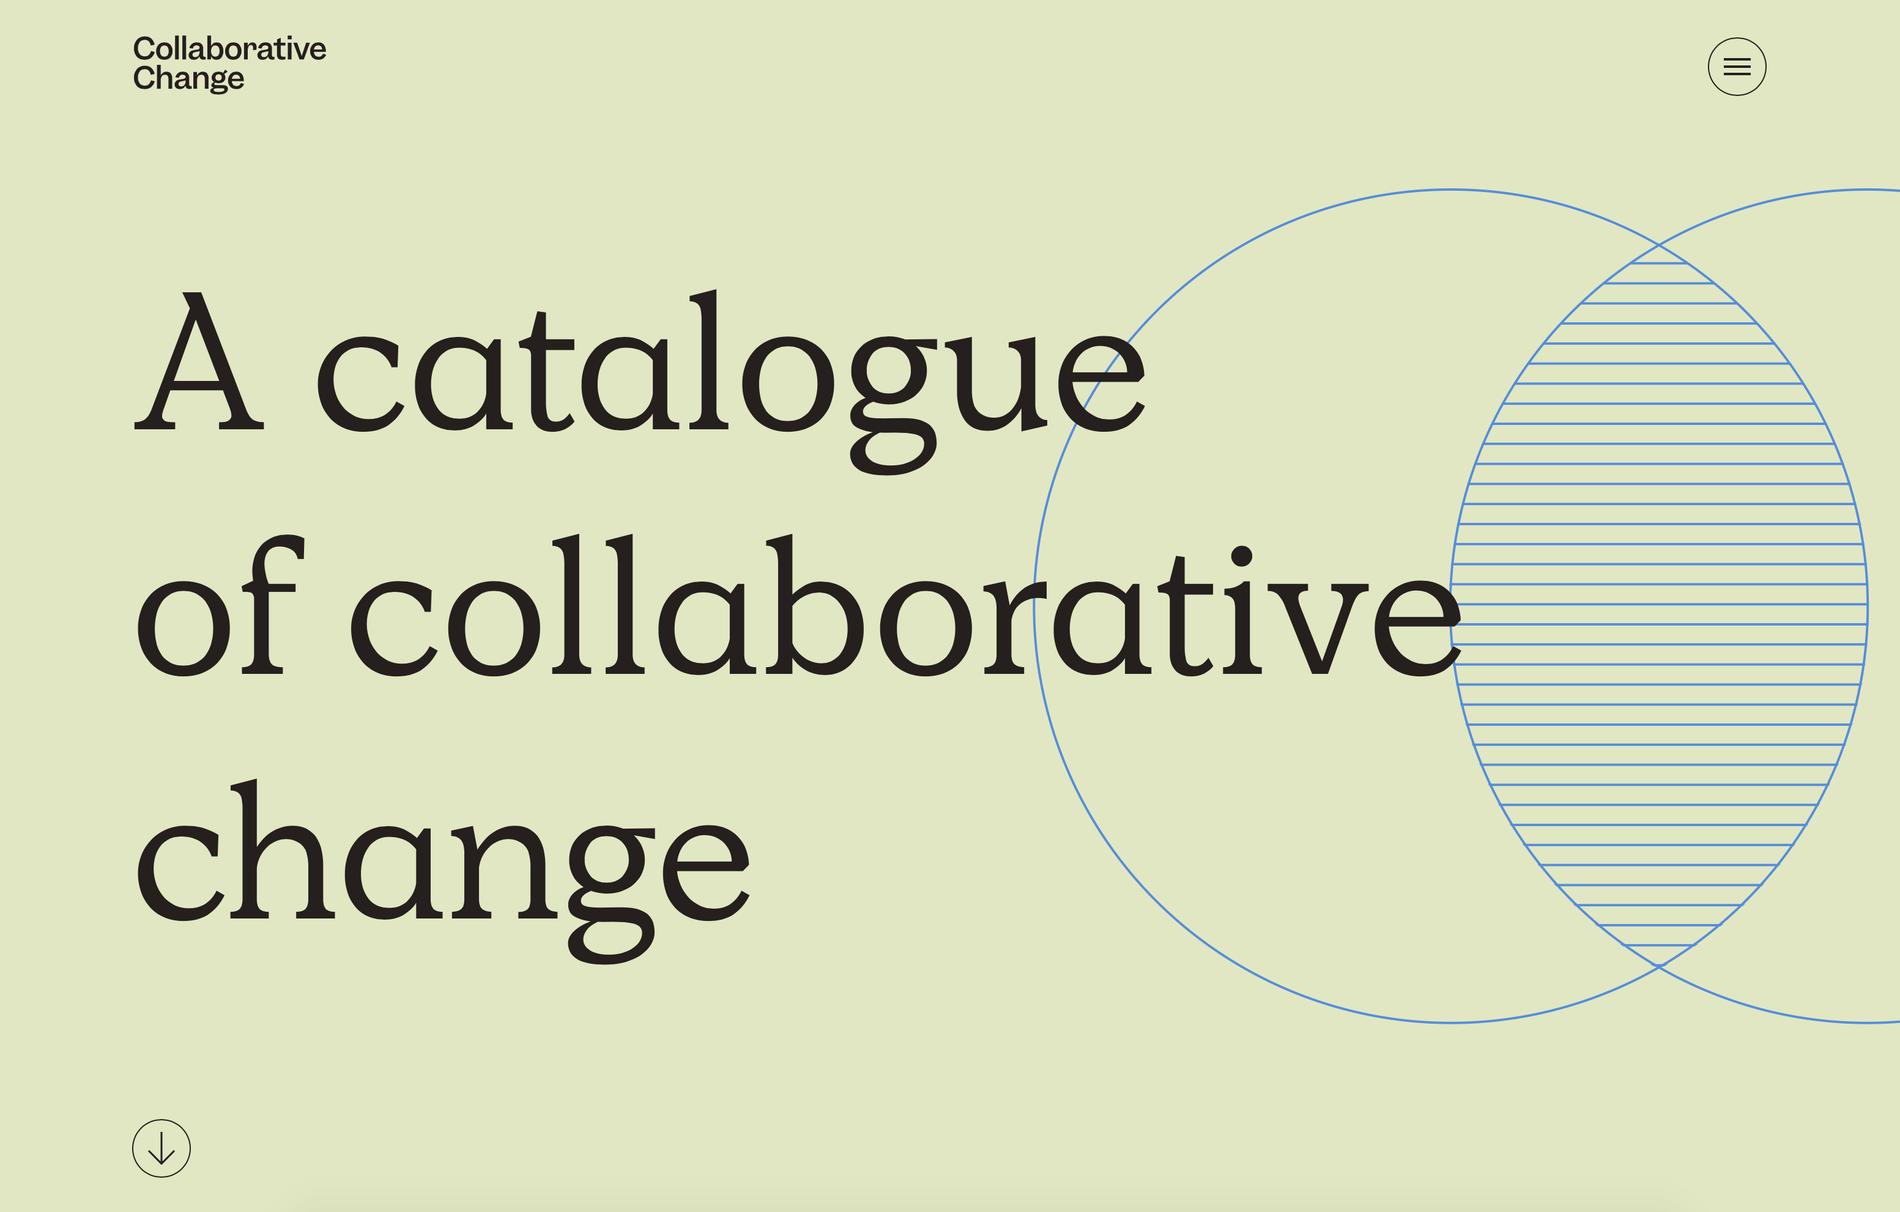 CollaborativeChange-Simula-Garnett-01.png